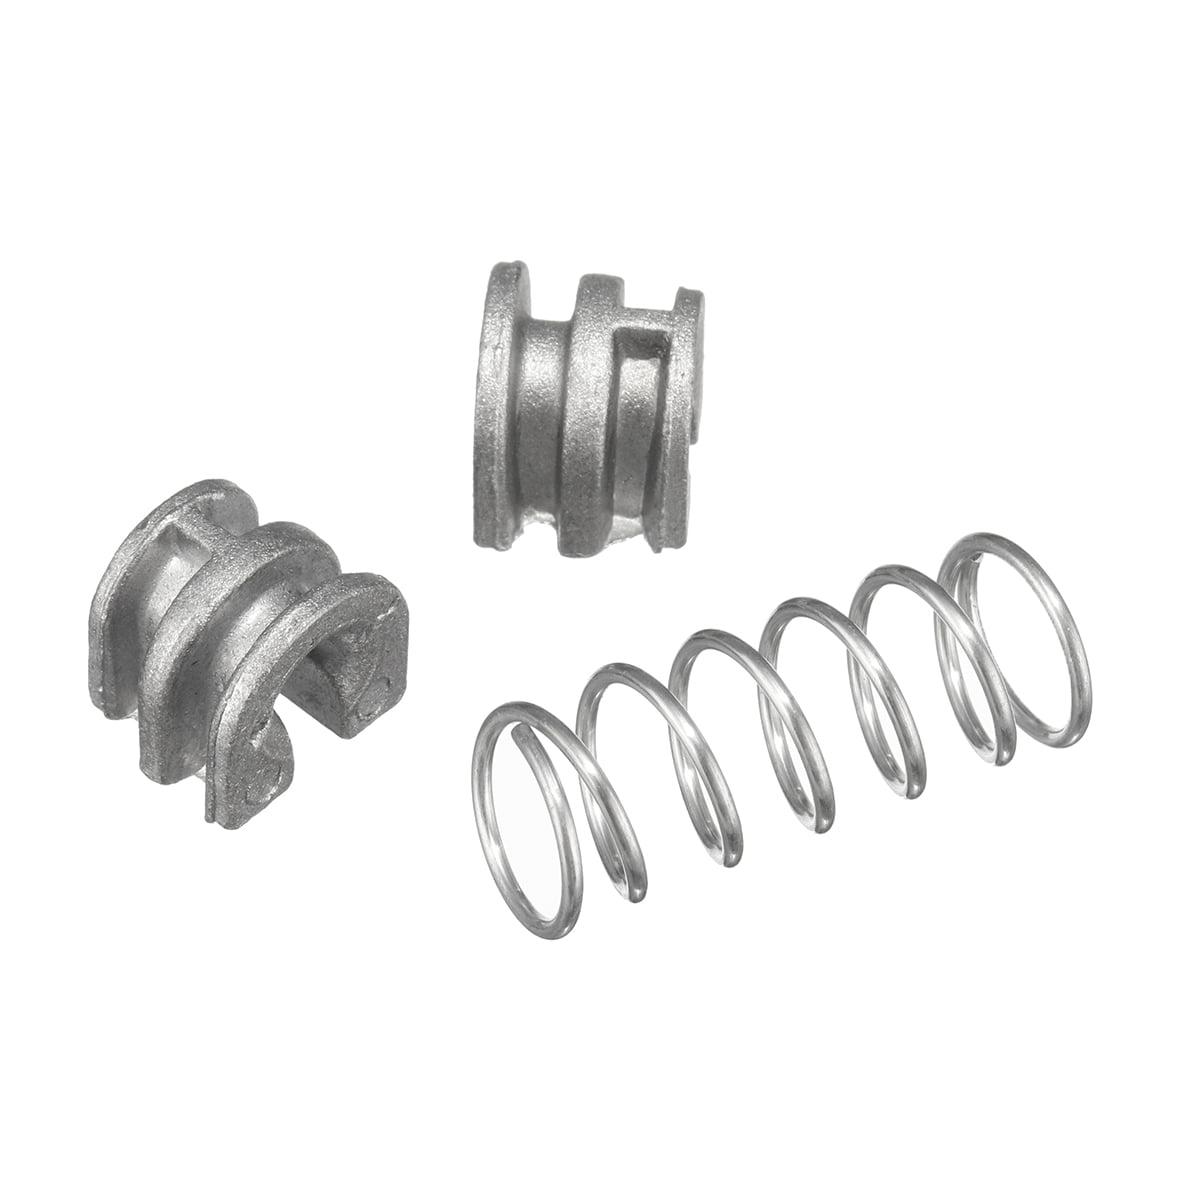 2-6pcs Replacement Trimmer Head Rebuild Kit For Stihl 25-2 FS 44 55 80 83 85 90